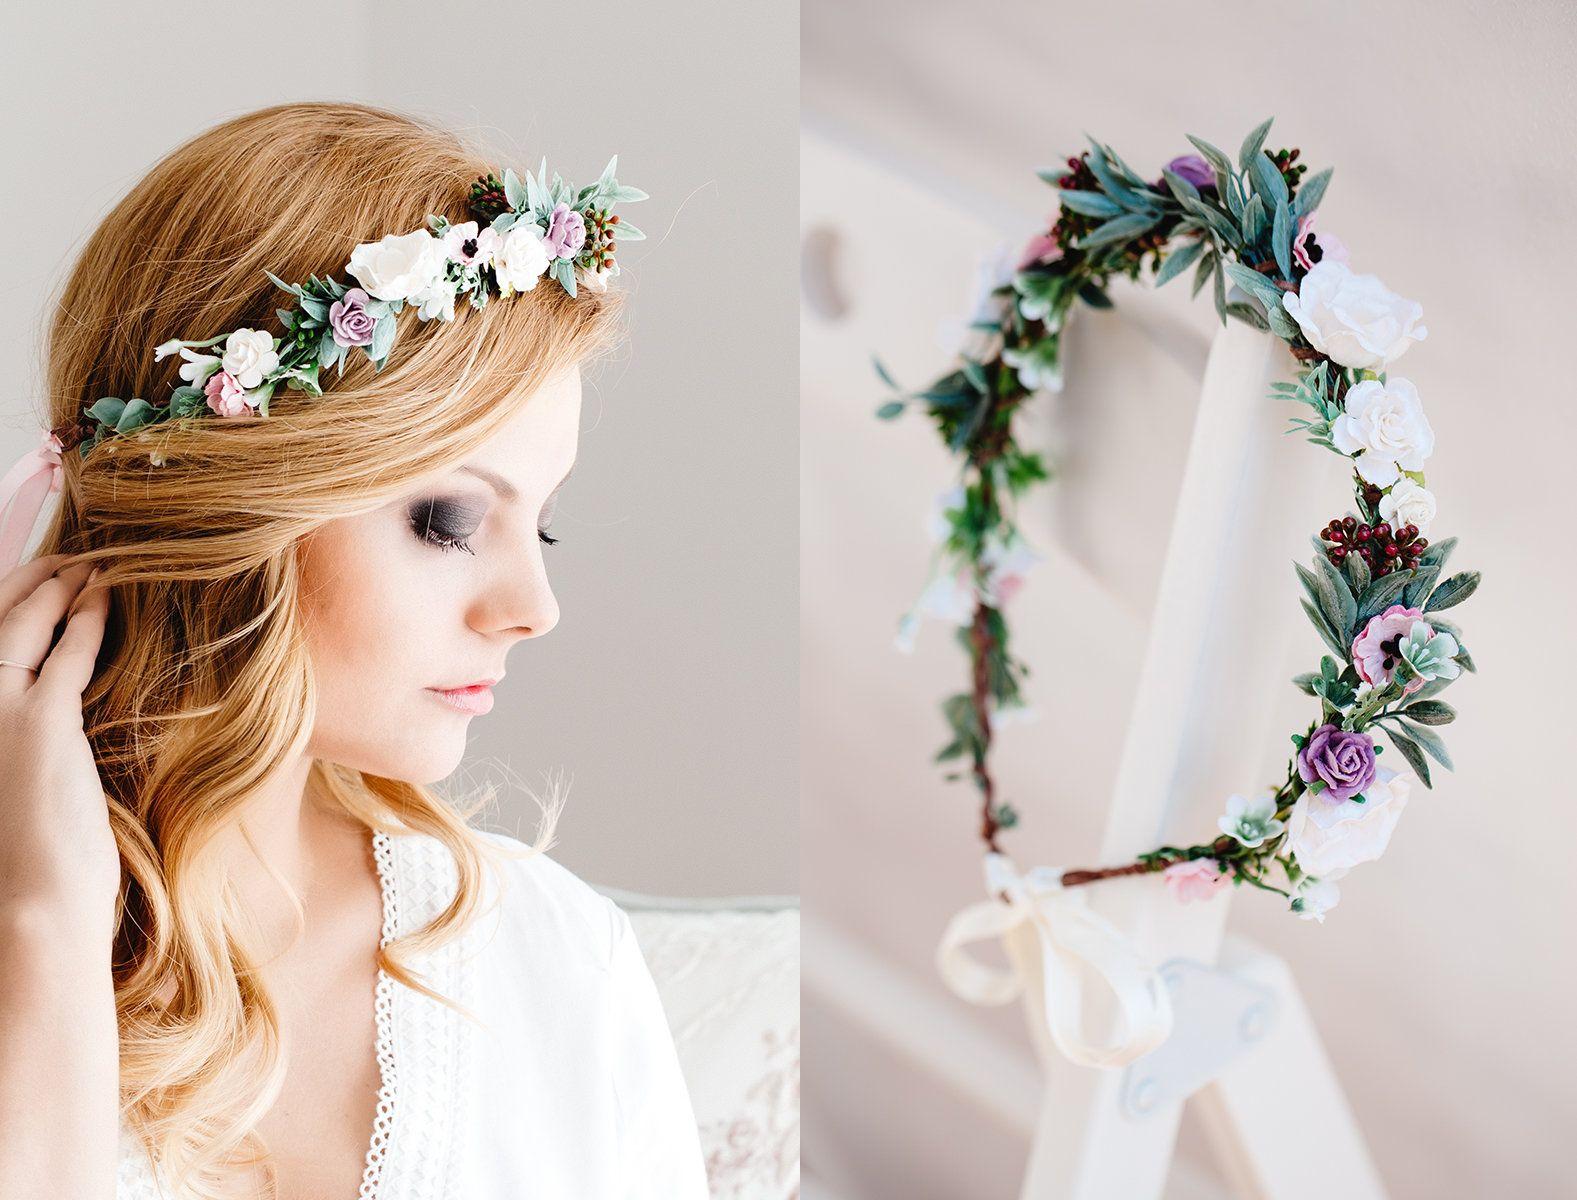 Flower Hairband Beach Crown Headdress Boho Wedding Headband Party Floral Bride